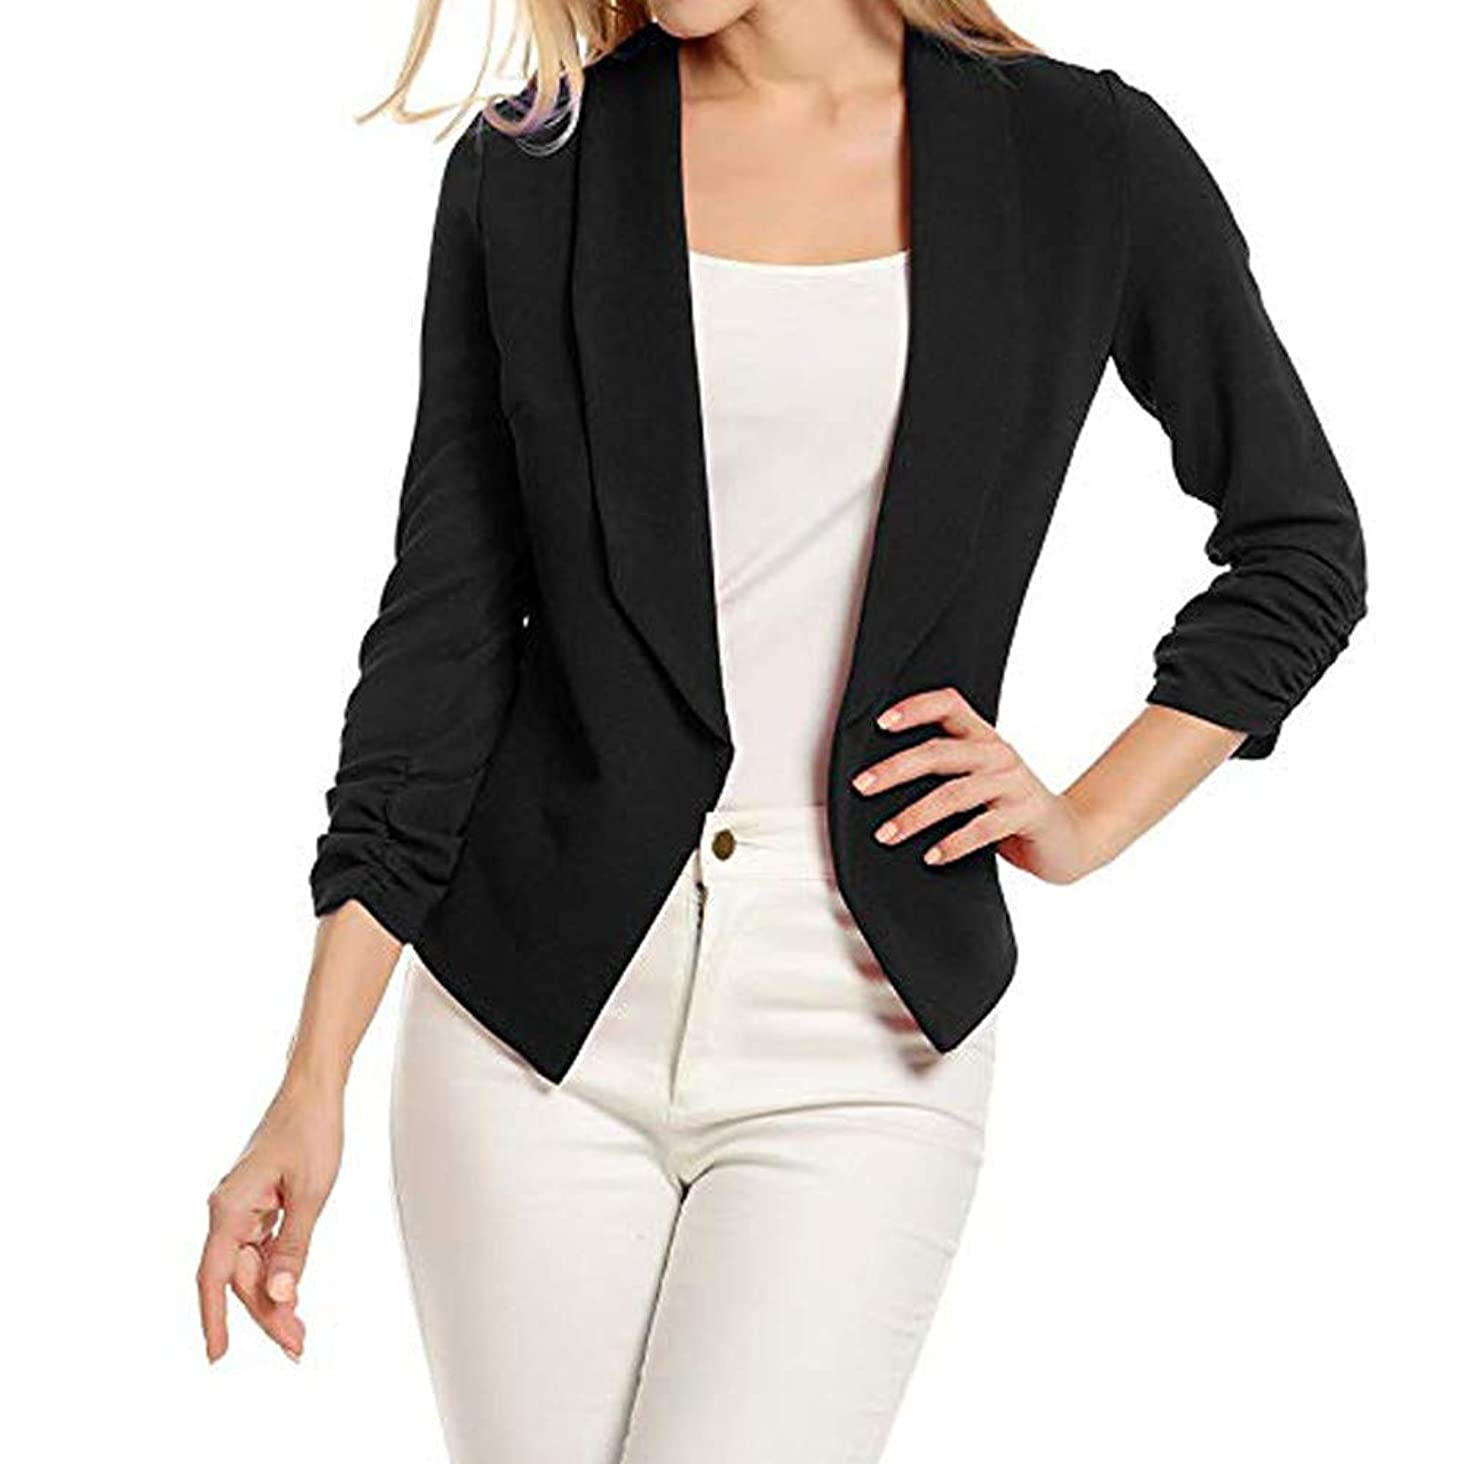 Kulywon Women 3/4 Sleeve Blazer Open Front Short Cardigan Suit Jacket Work Office Coat